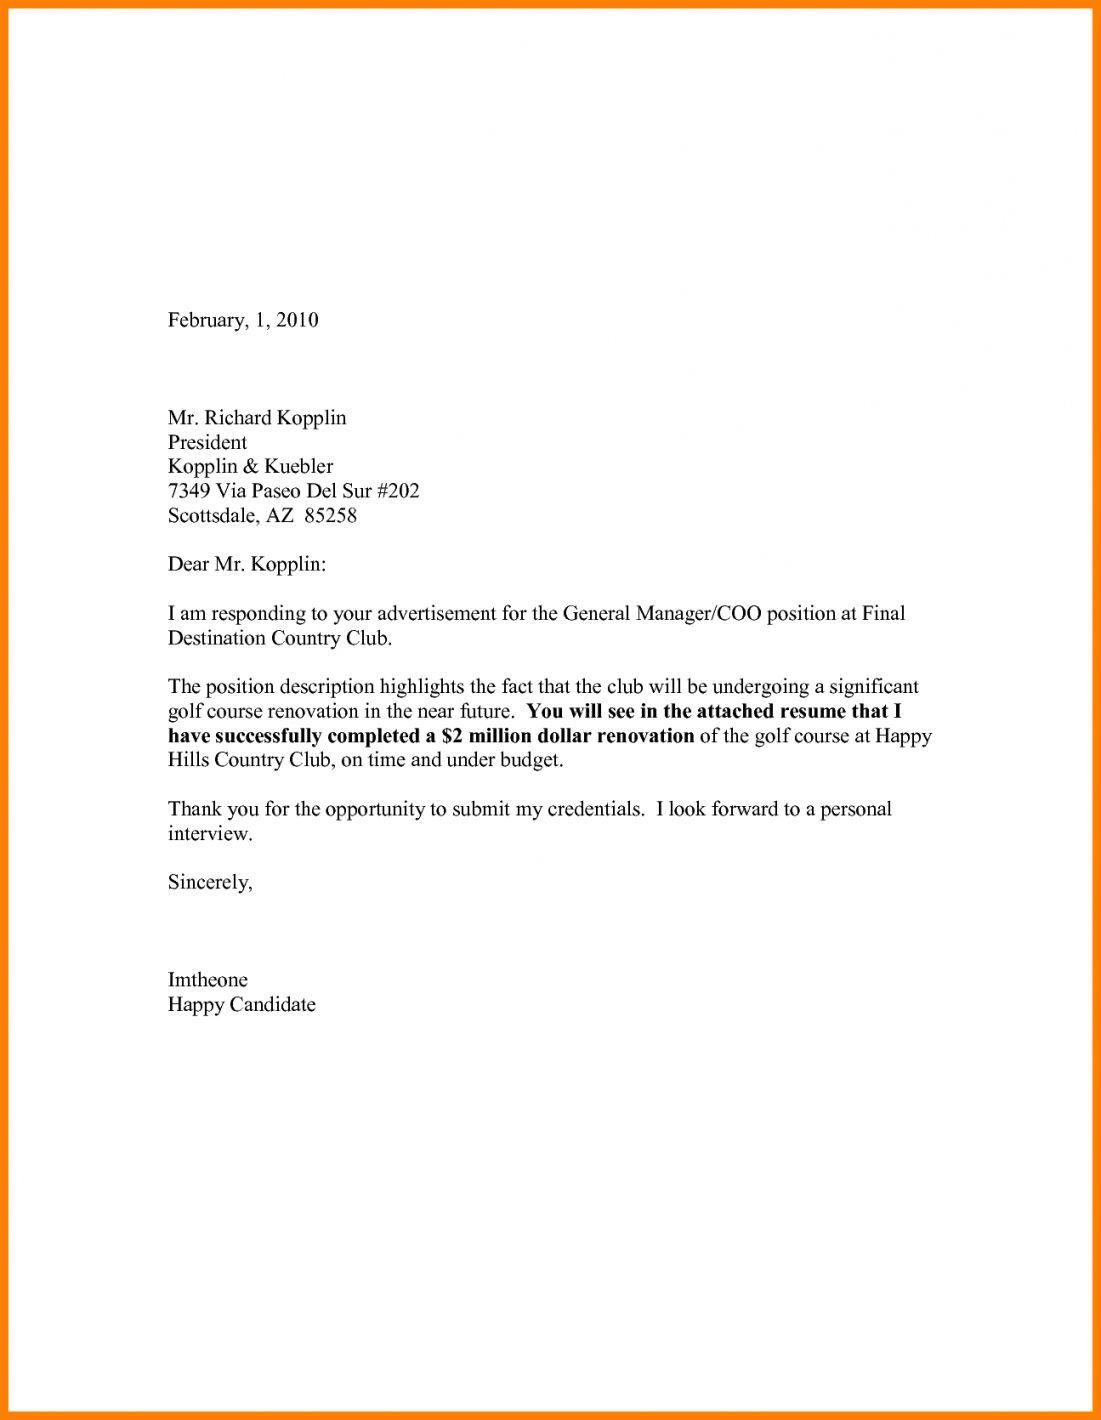 007 Formidable Cover Letter For Job Template Image  Sample Cv Application Email Resume Microsoft WordFull